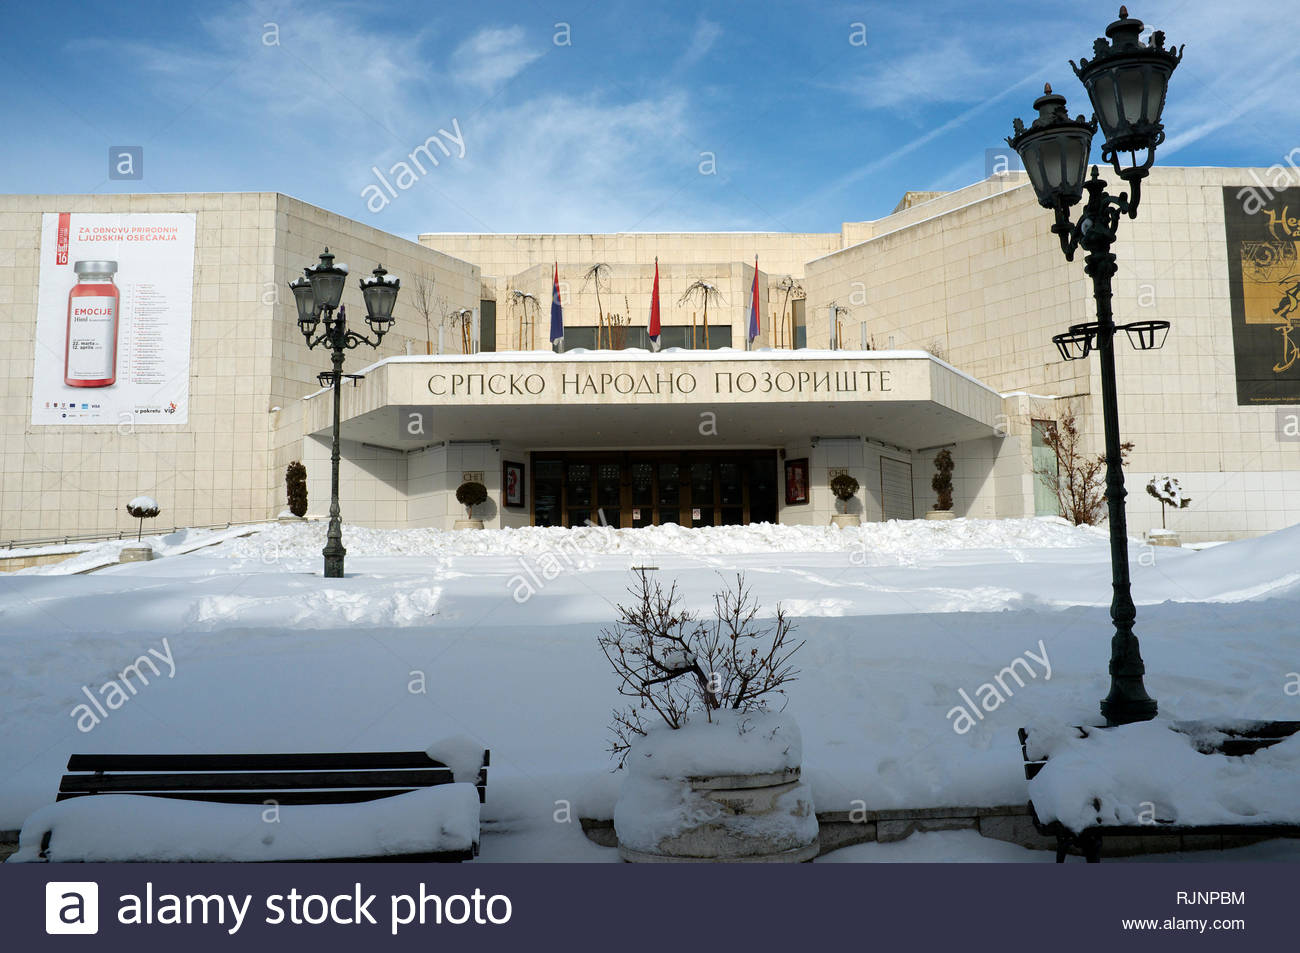 The Serbian National Theatre, in the city of Novi Sad, Vojvodina, Serbia. Stock Photo